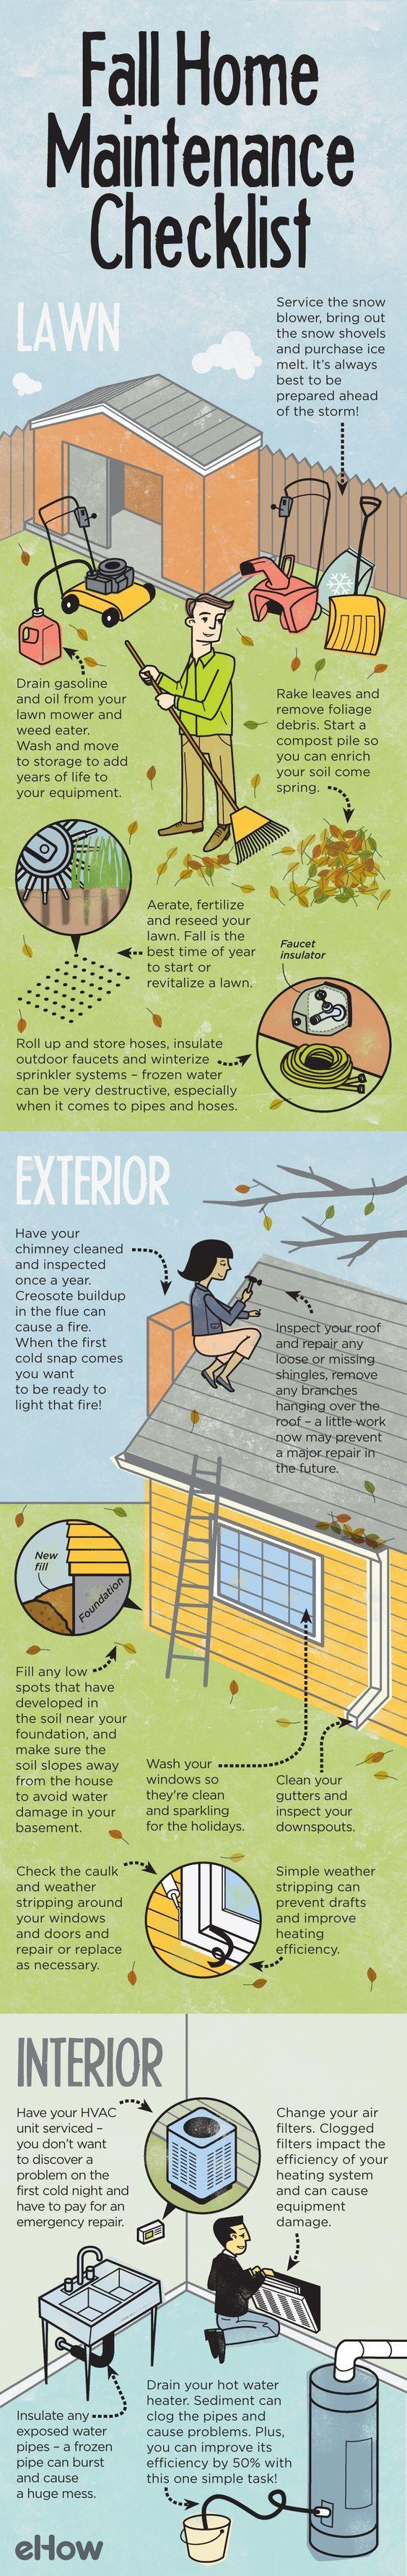 17 Best ideas about Home Maintenance Checklist on Pinterest | Home ...